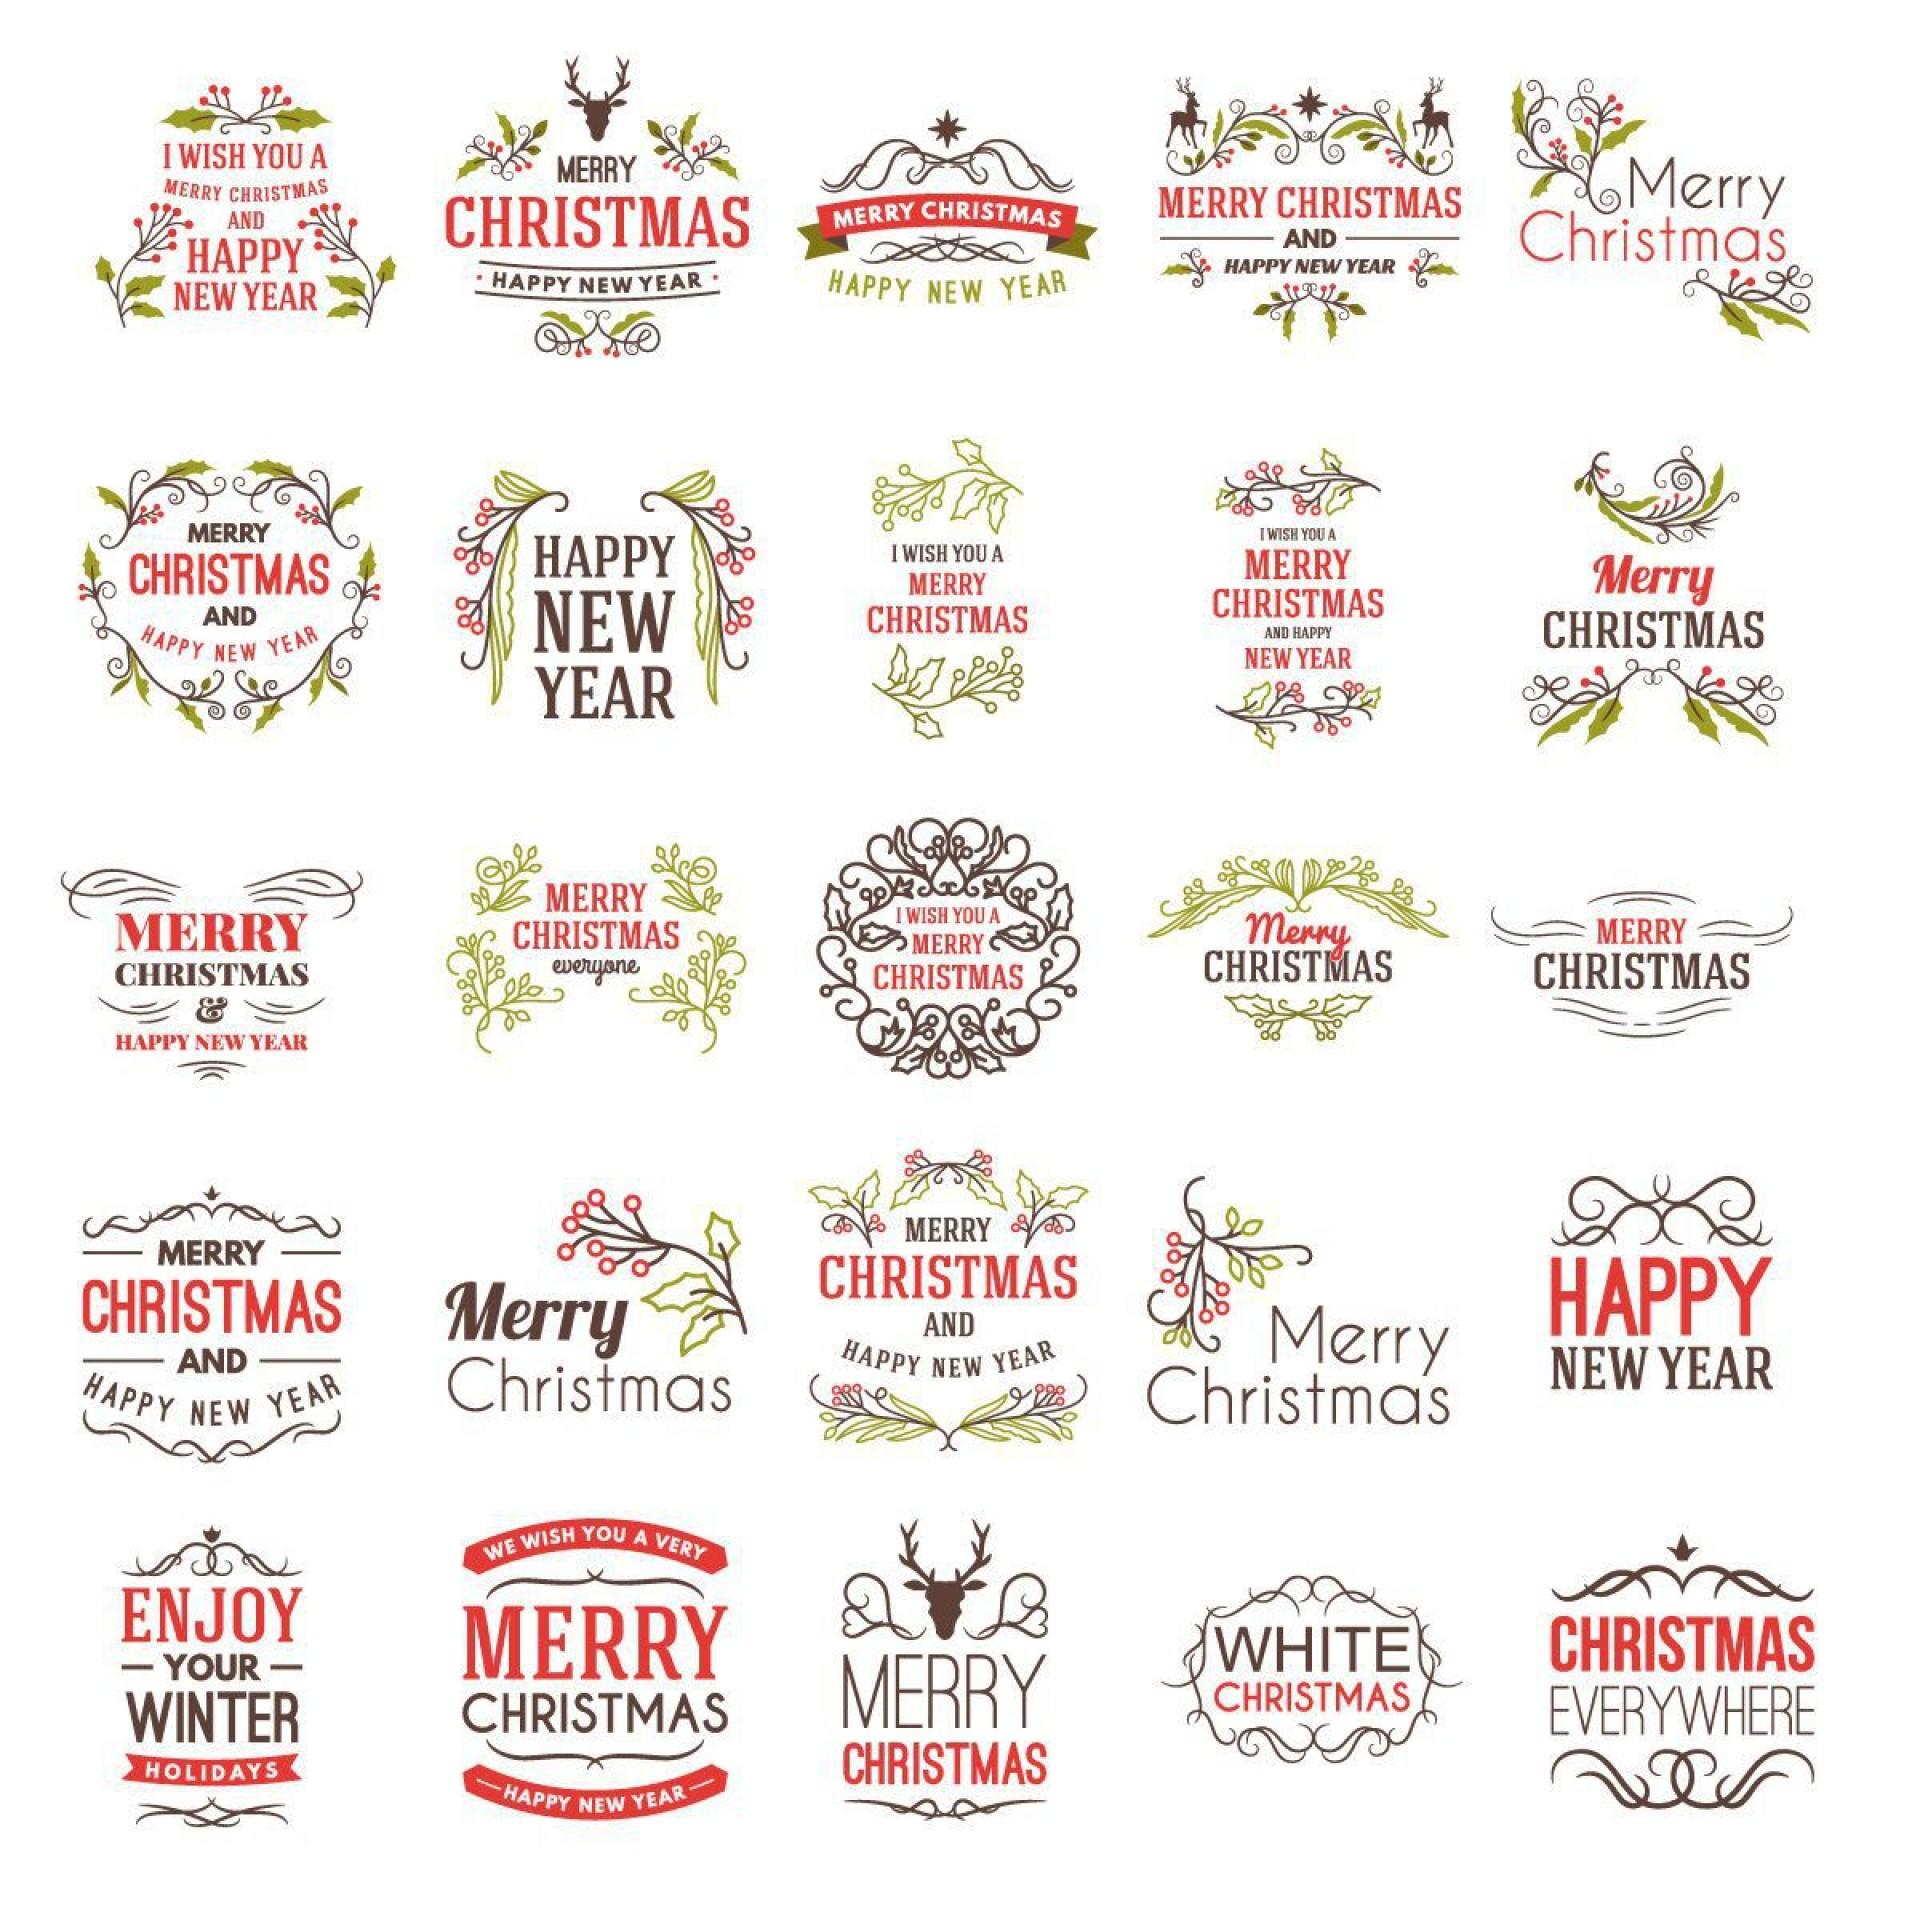 000 Awesome Free Addres Label Template Christma Sample  Christmas Return 30 Per Sheet Microsoft Word1920